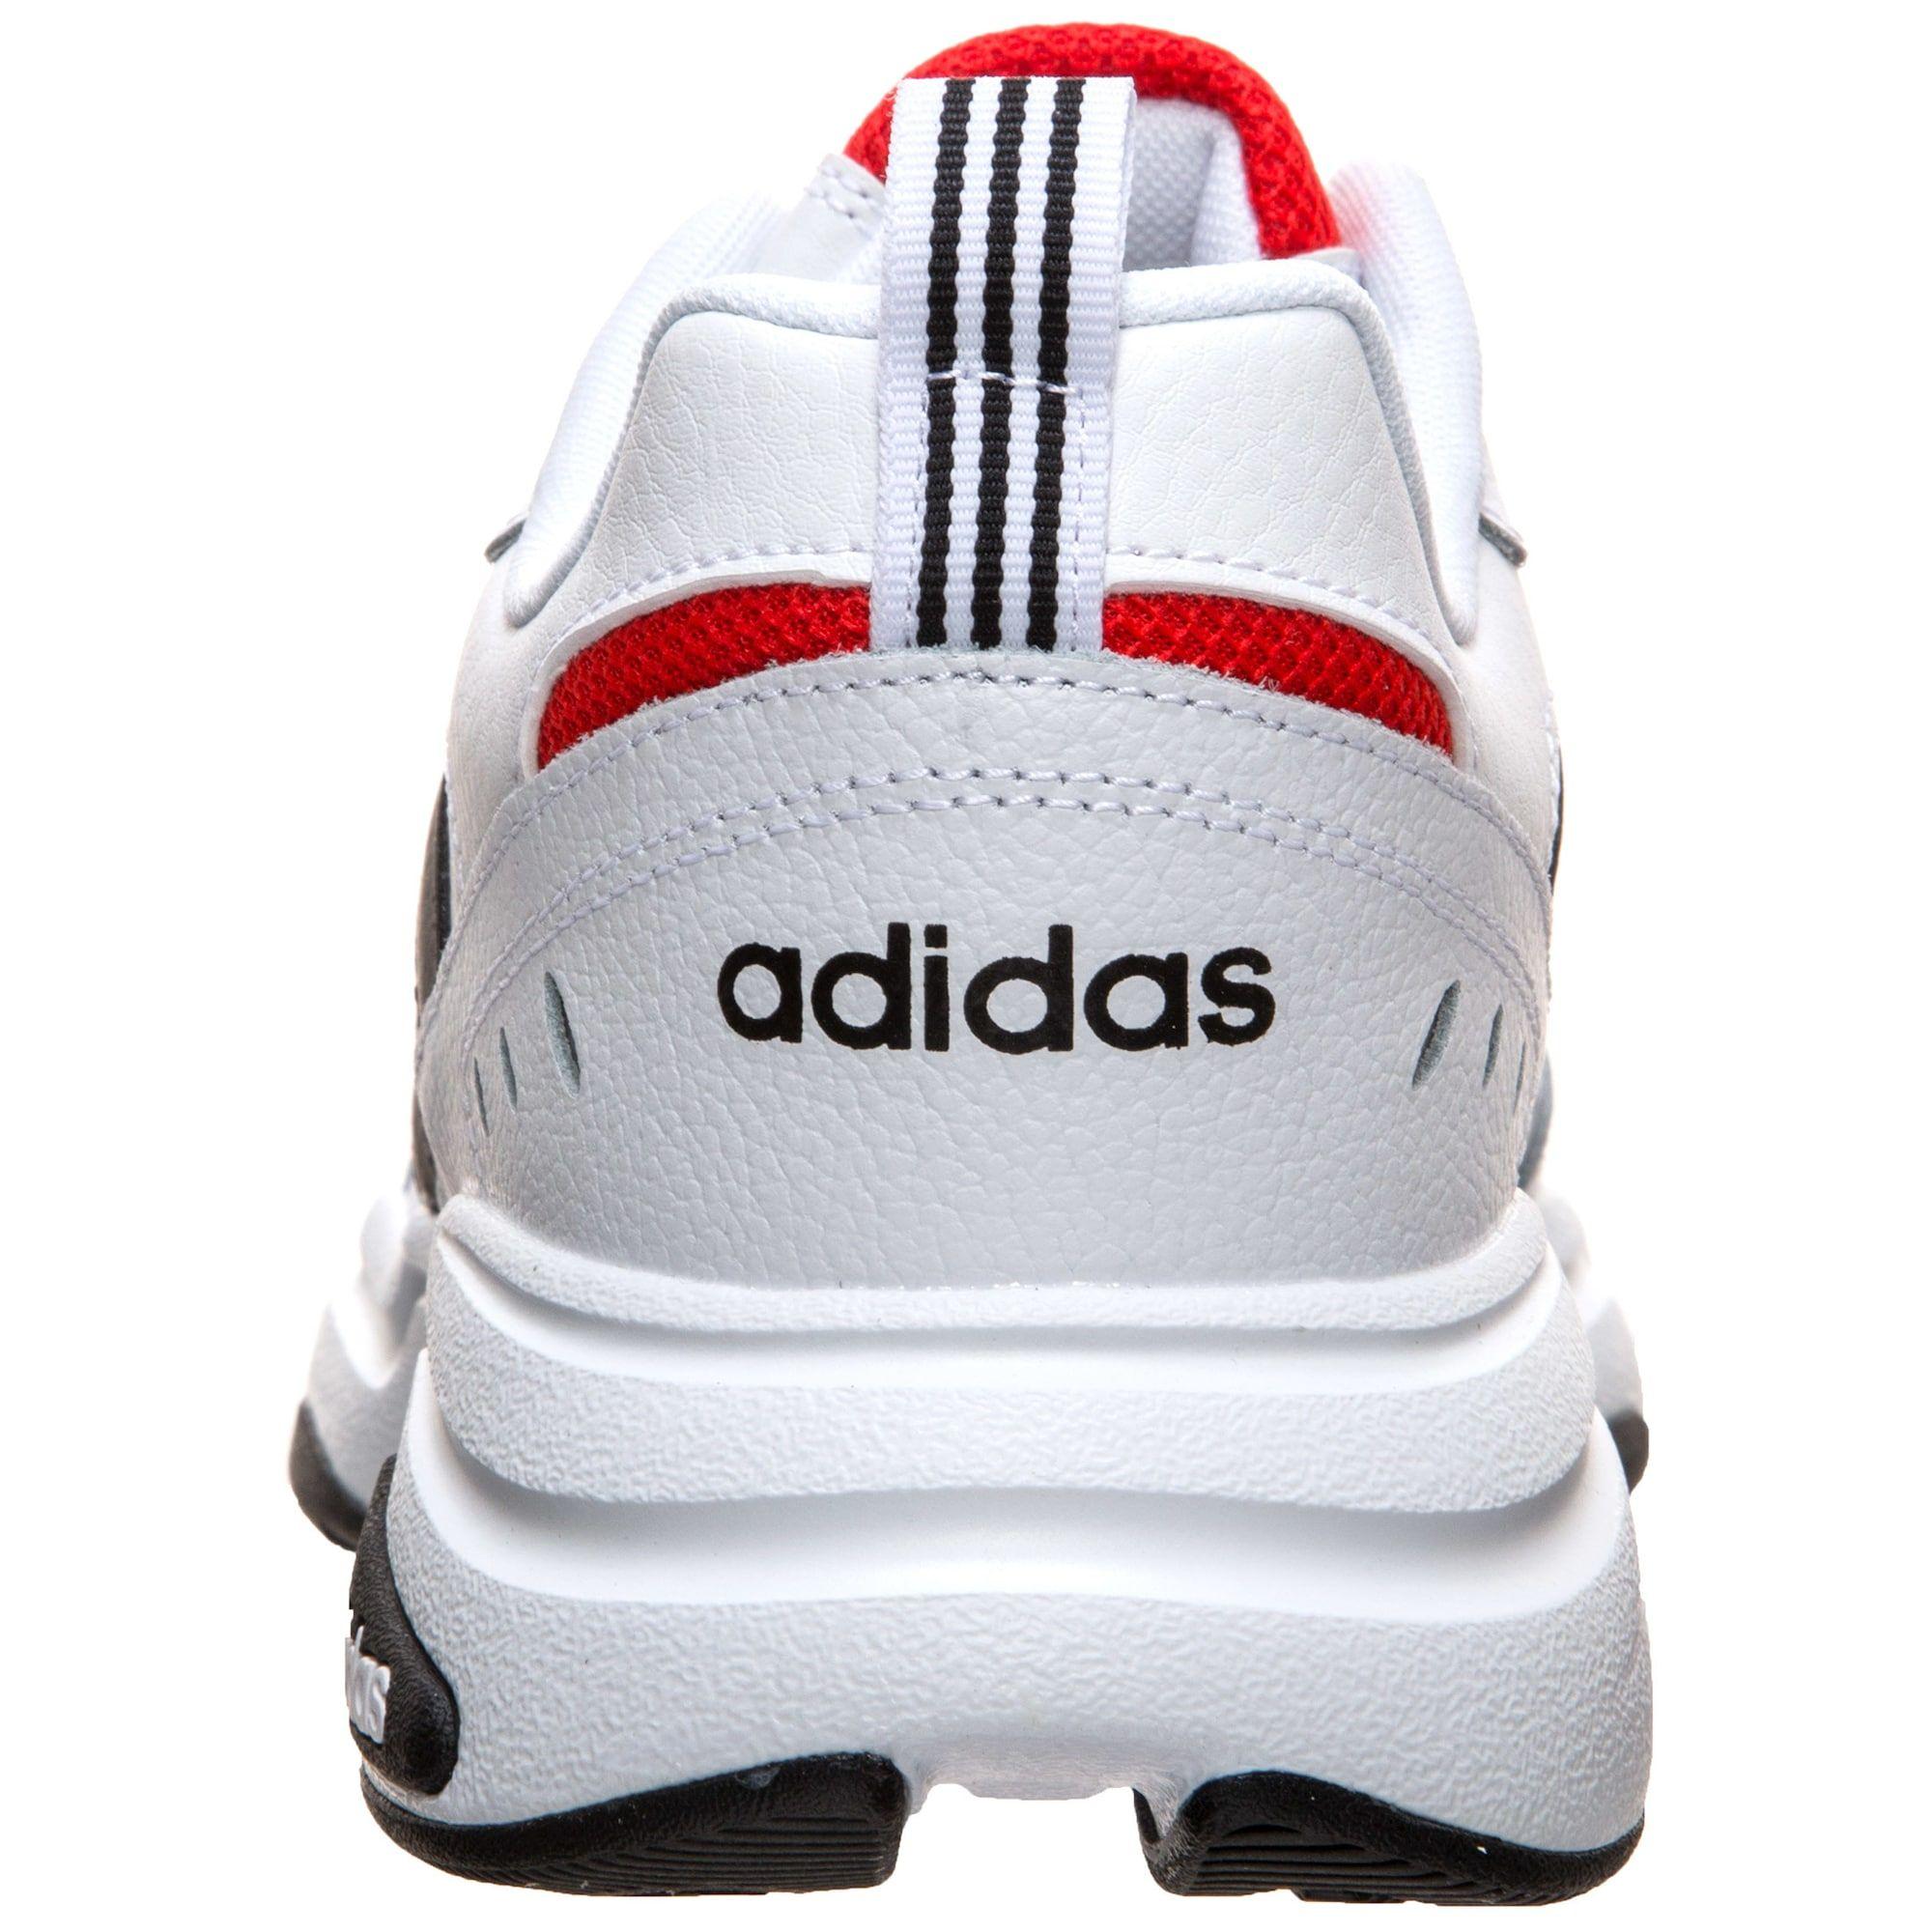 Adidas Performance Sneaker Strutter Herren Weiss Schwarz Rot Grosse 47 1 2 Sneaker Adidas